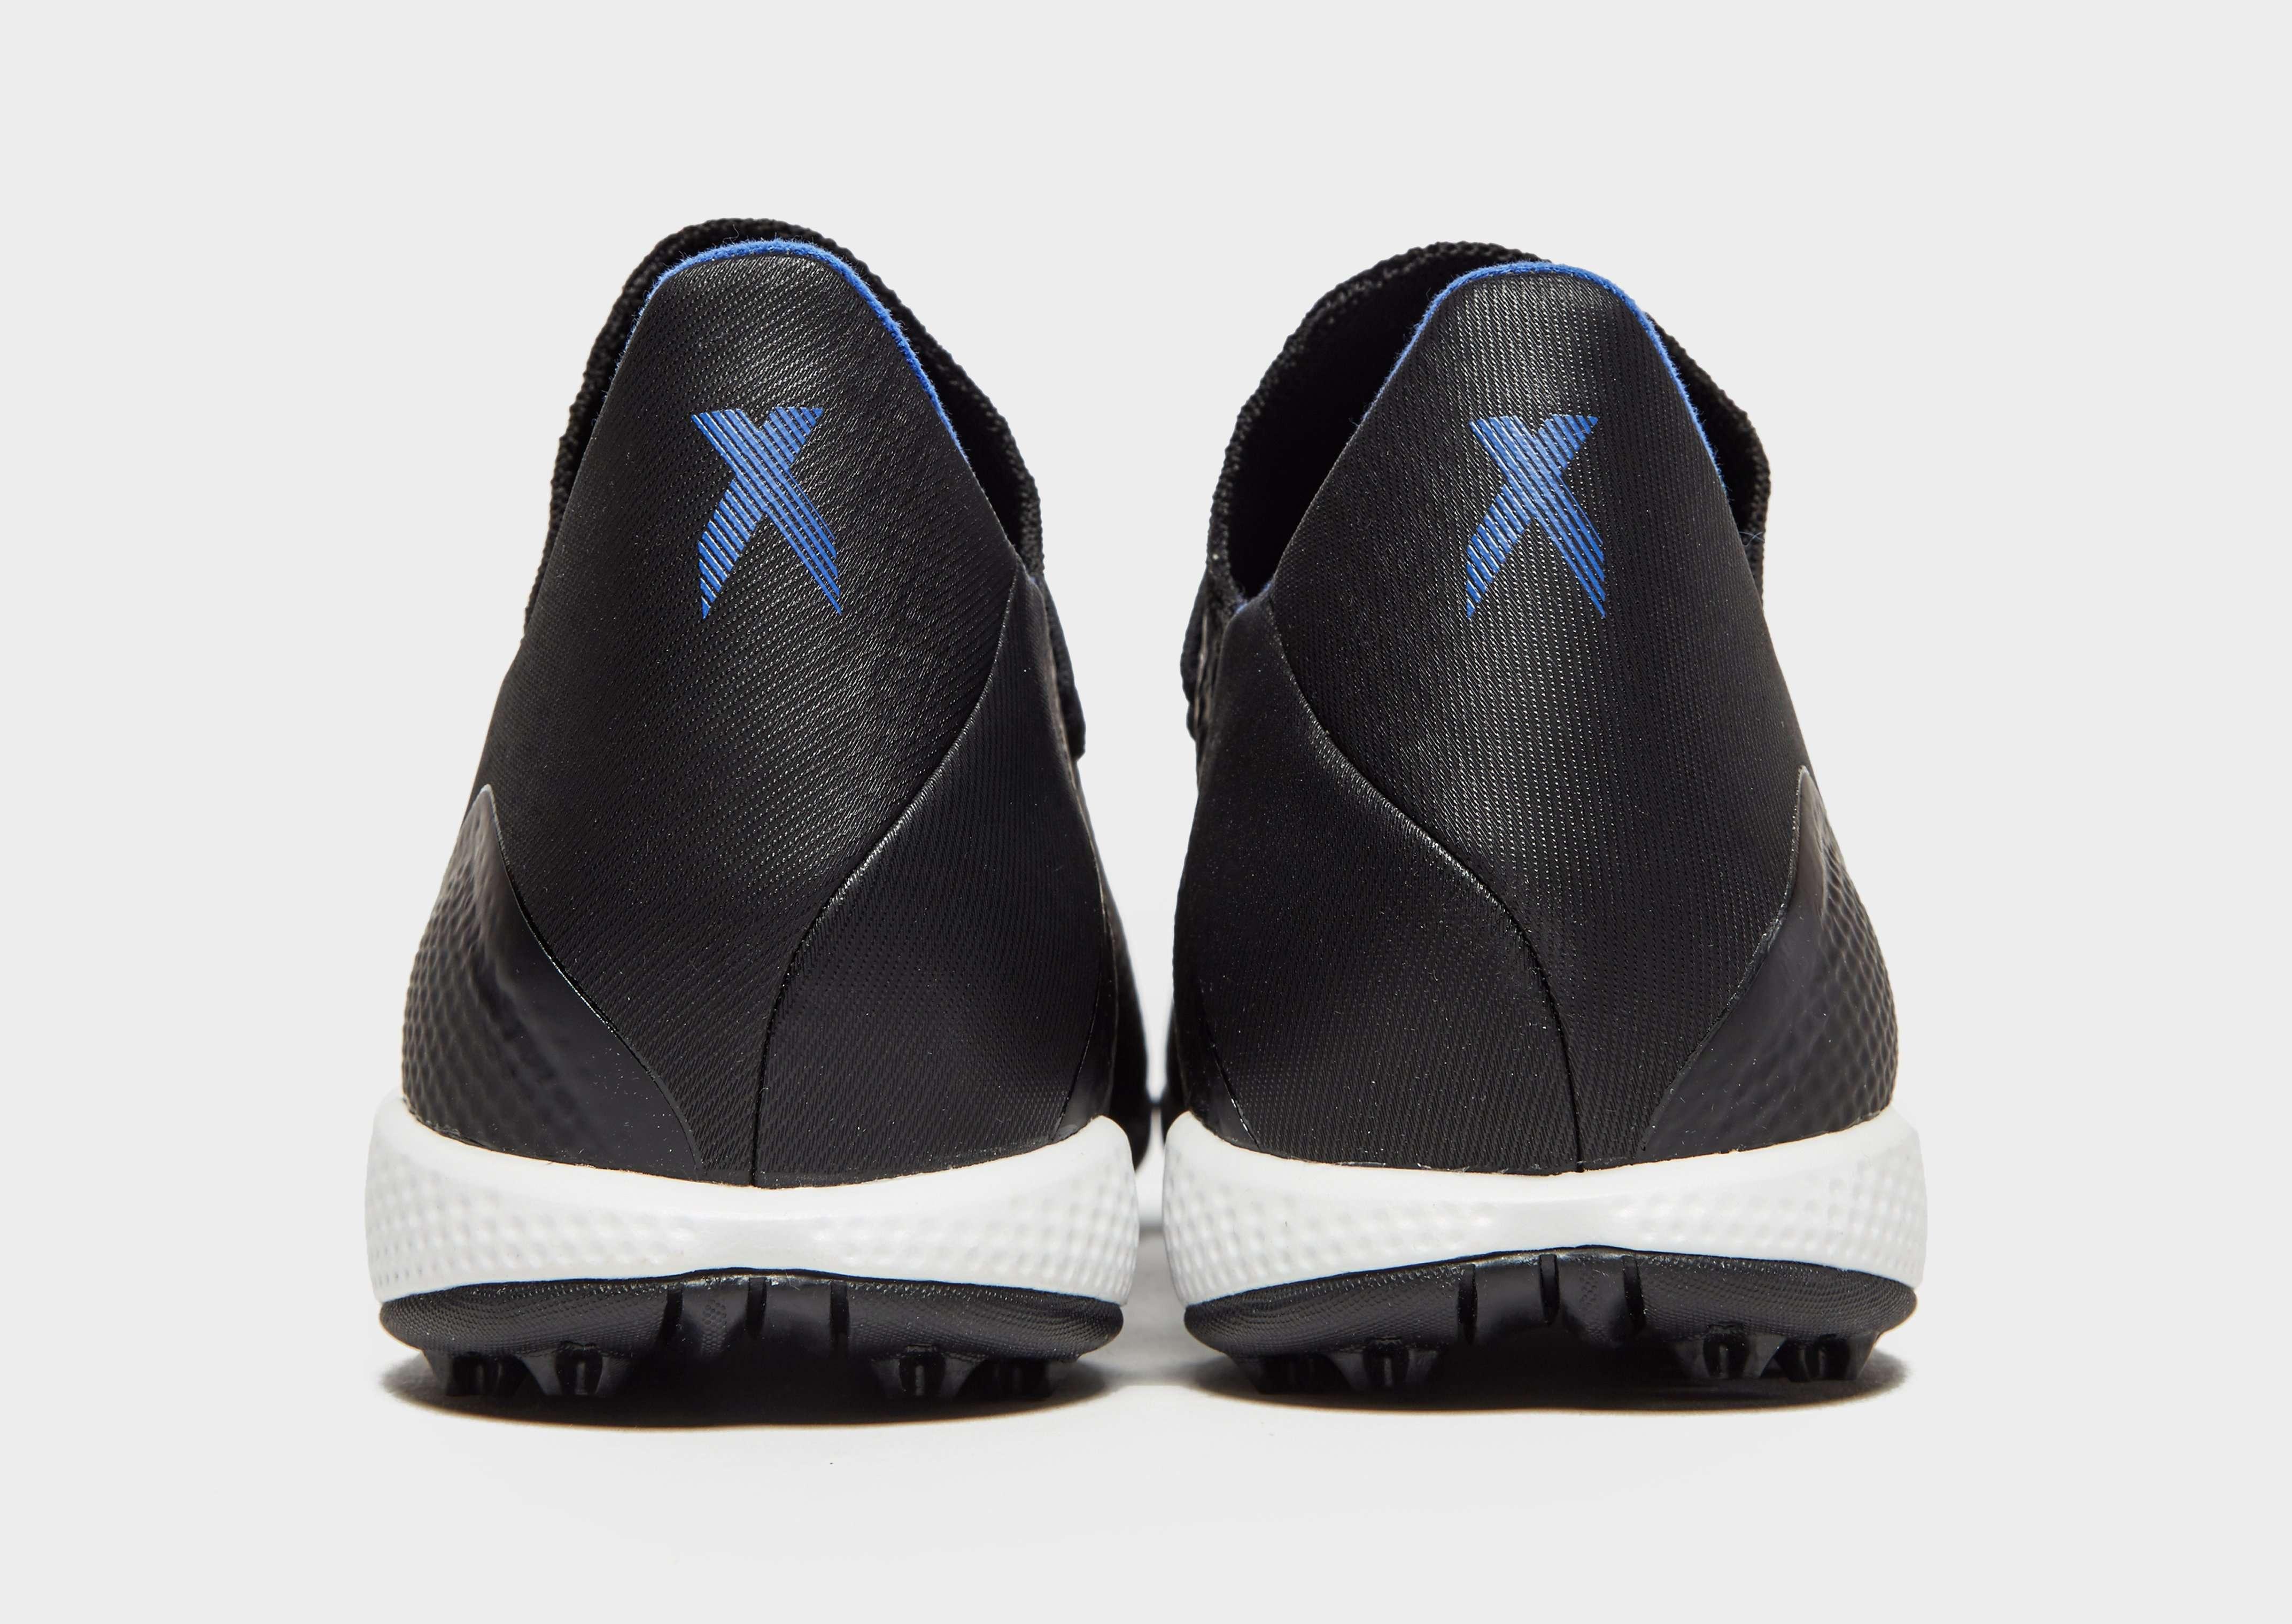 adidas Archetic X 18.3 TF